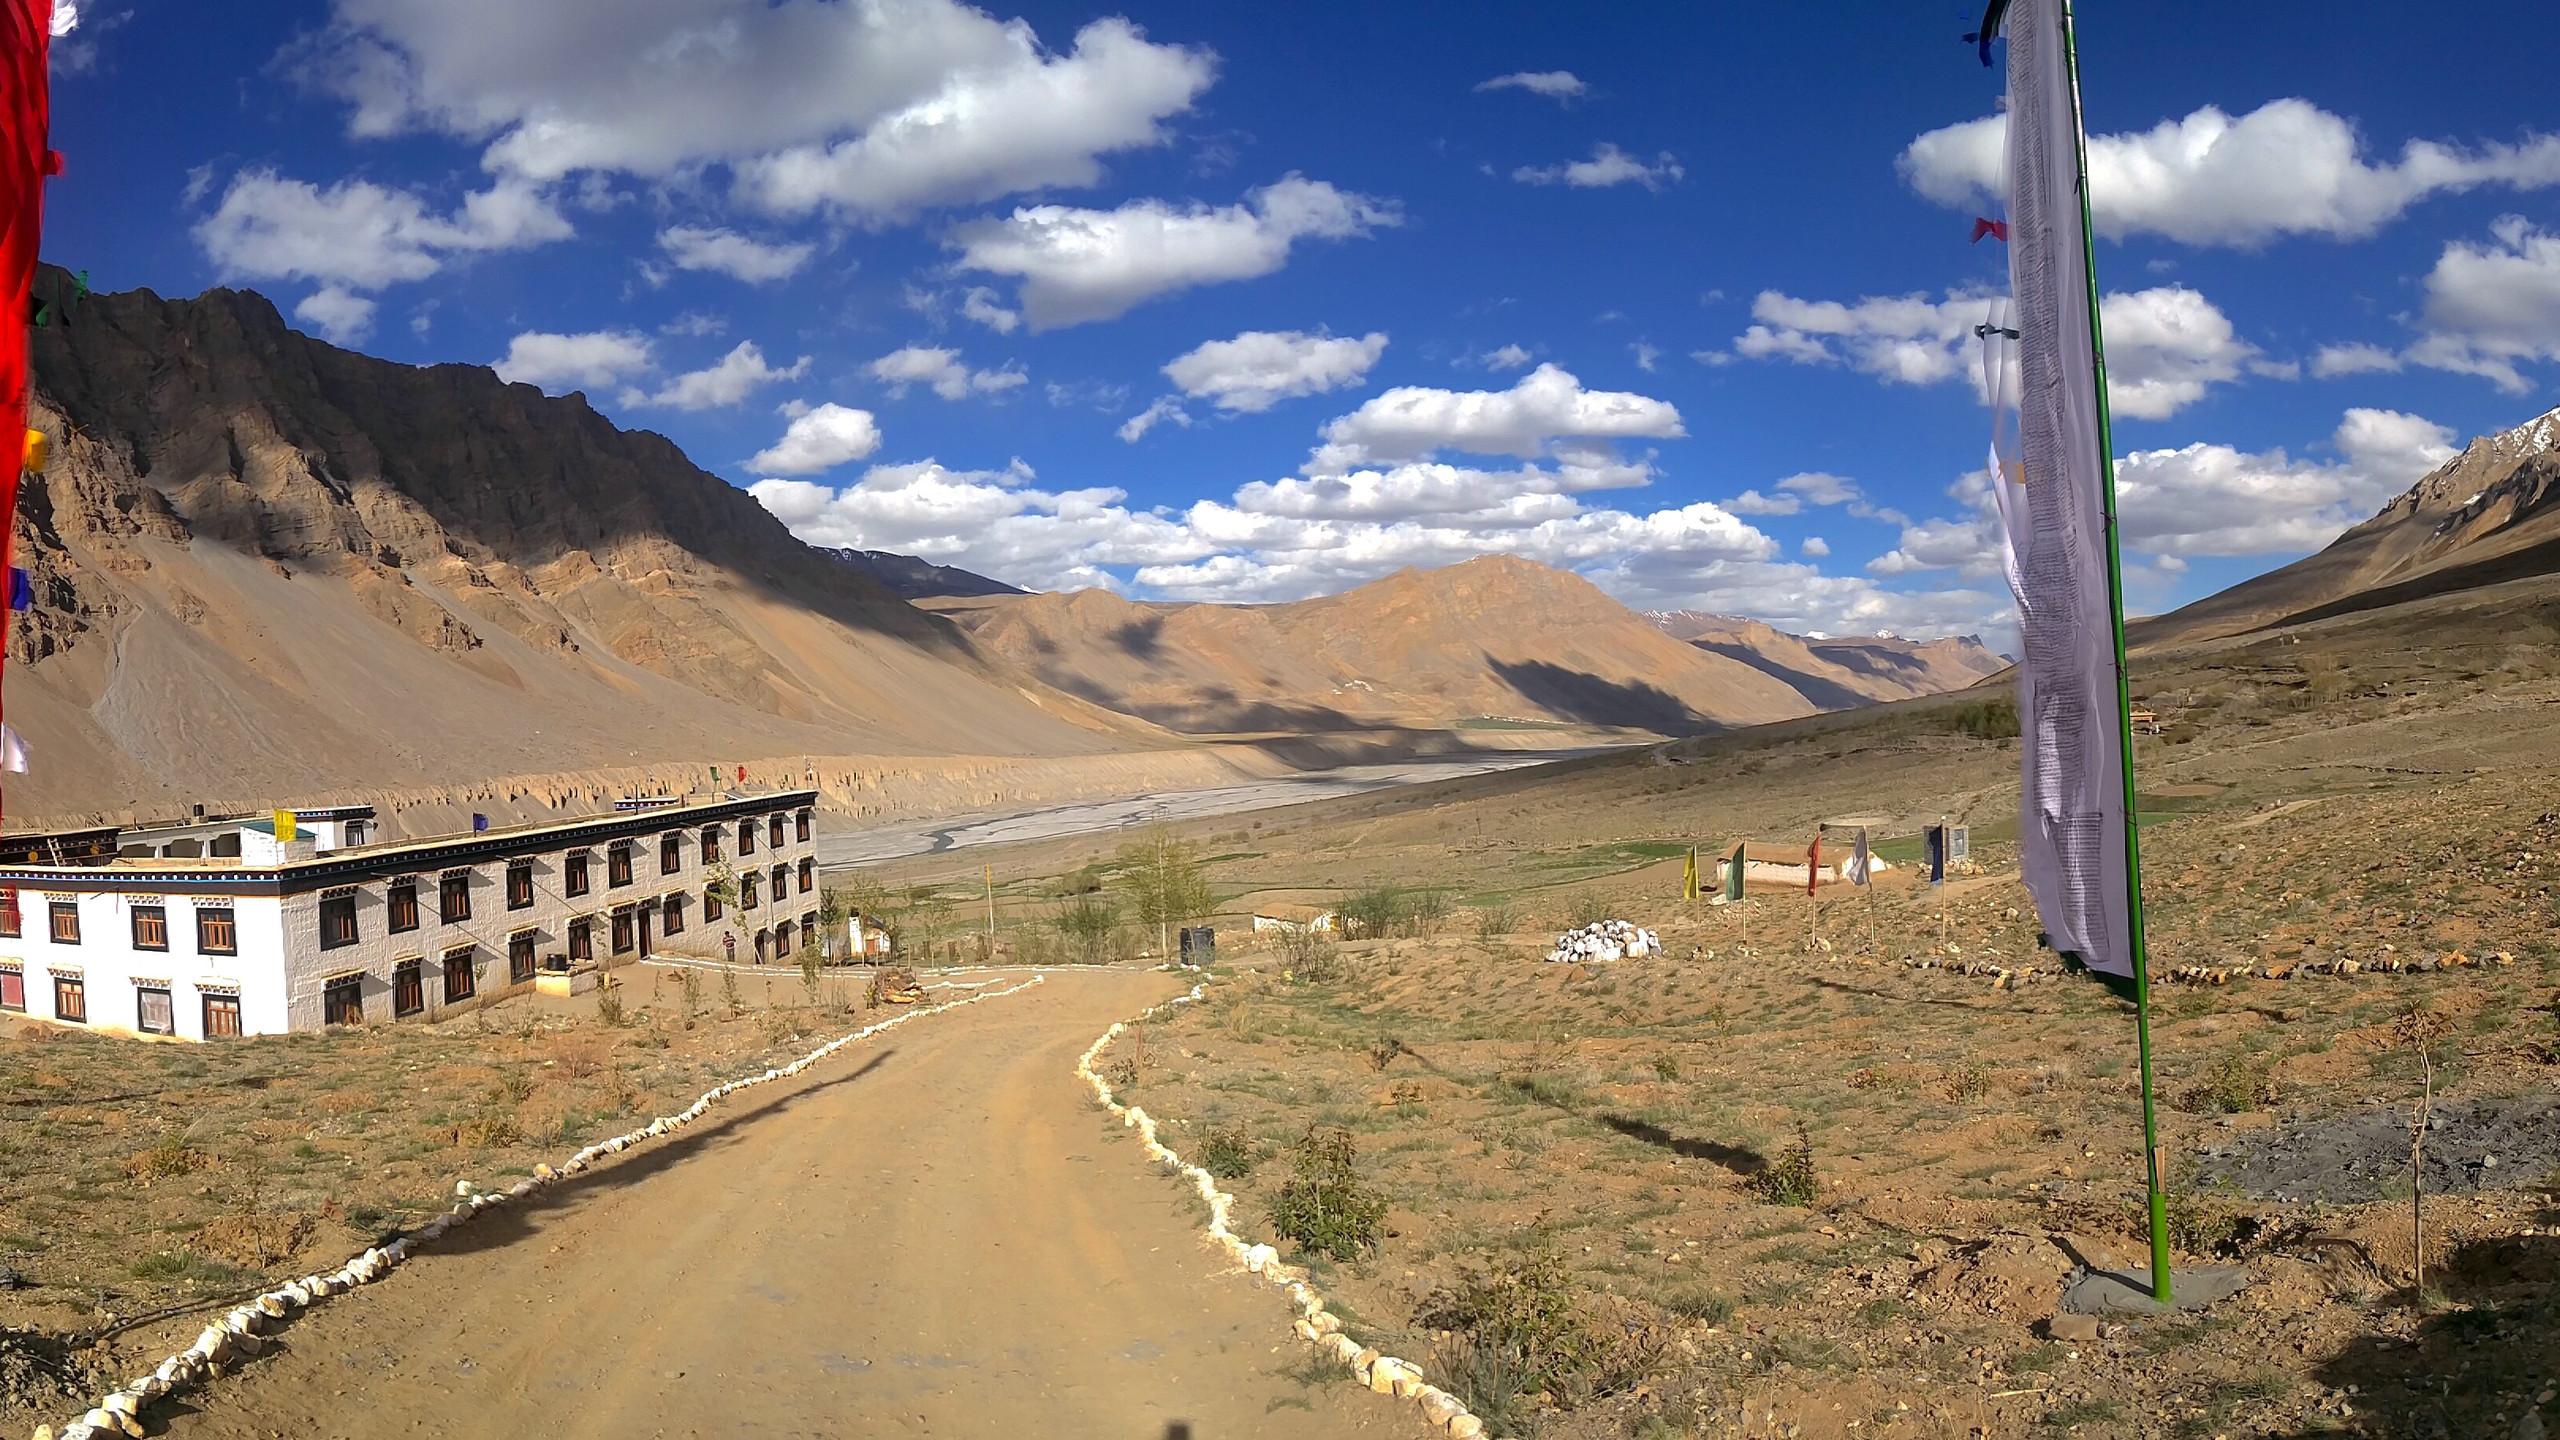 Buddhist Nunnery, Spiti Valley, Himalayas, India